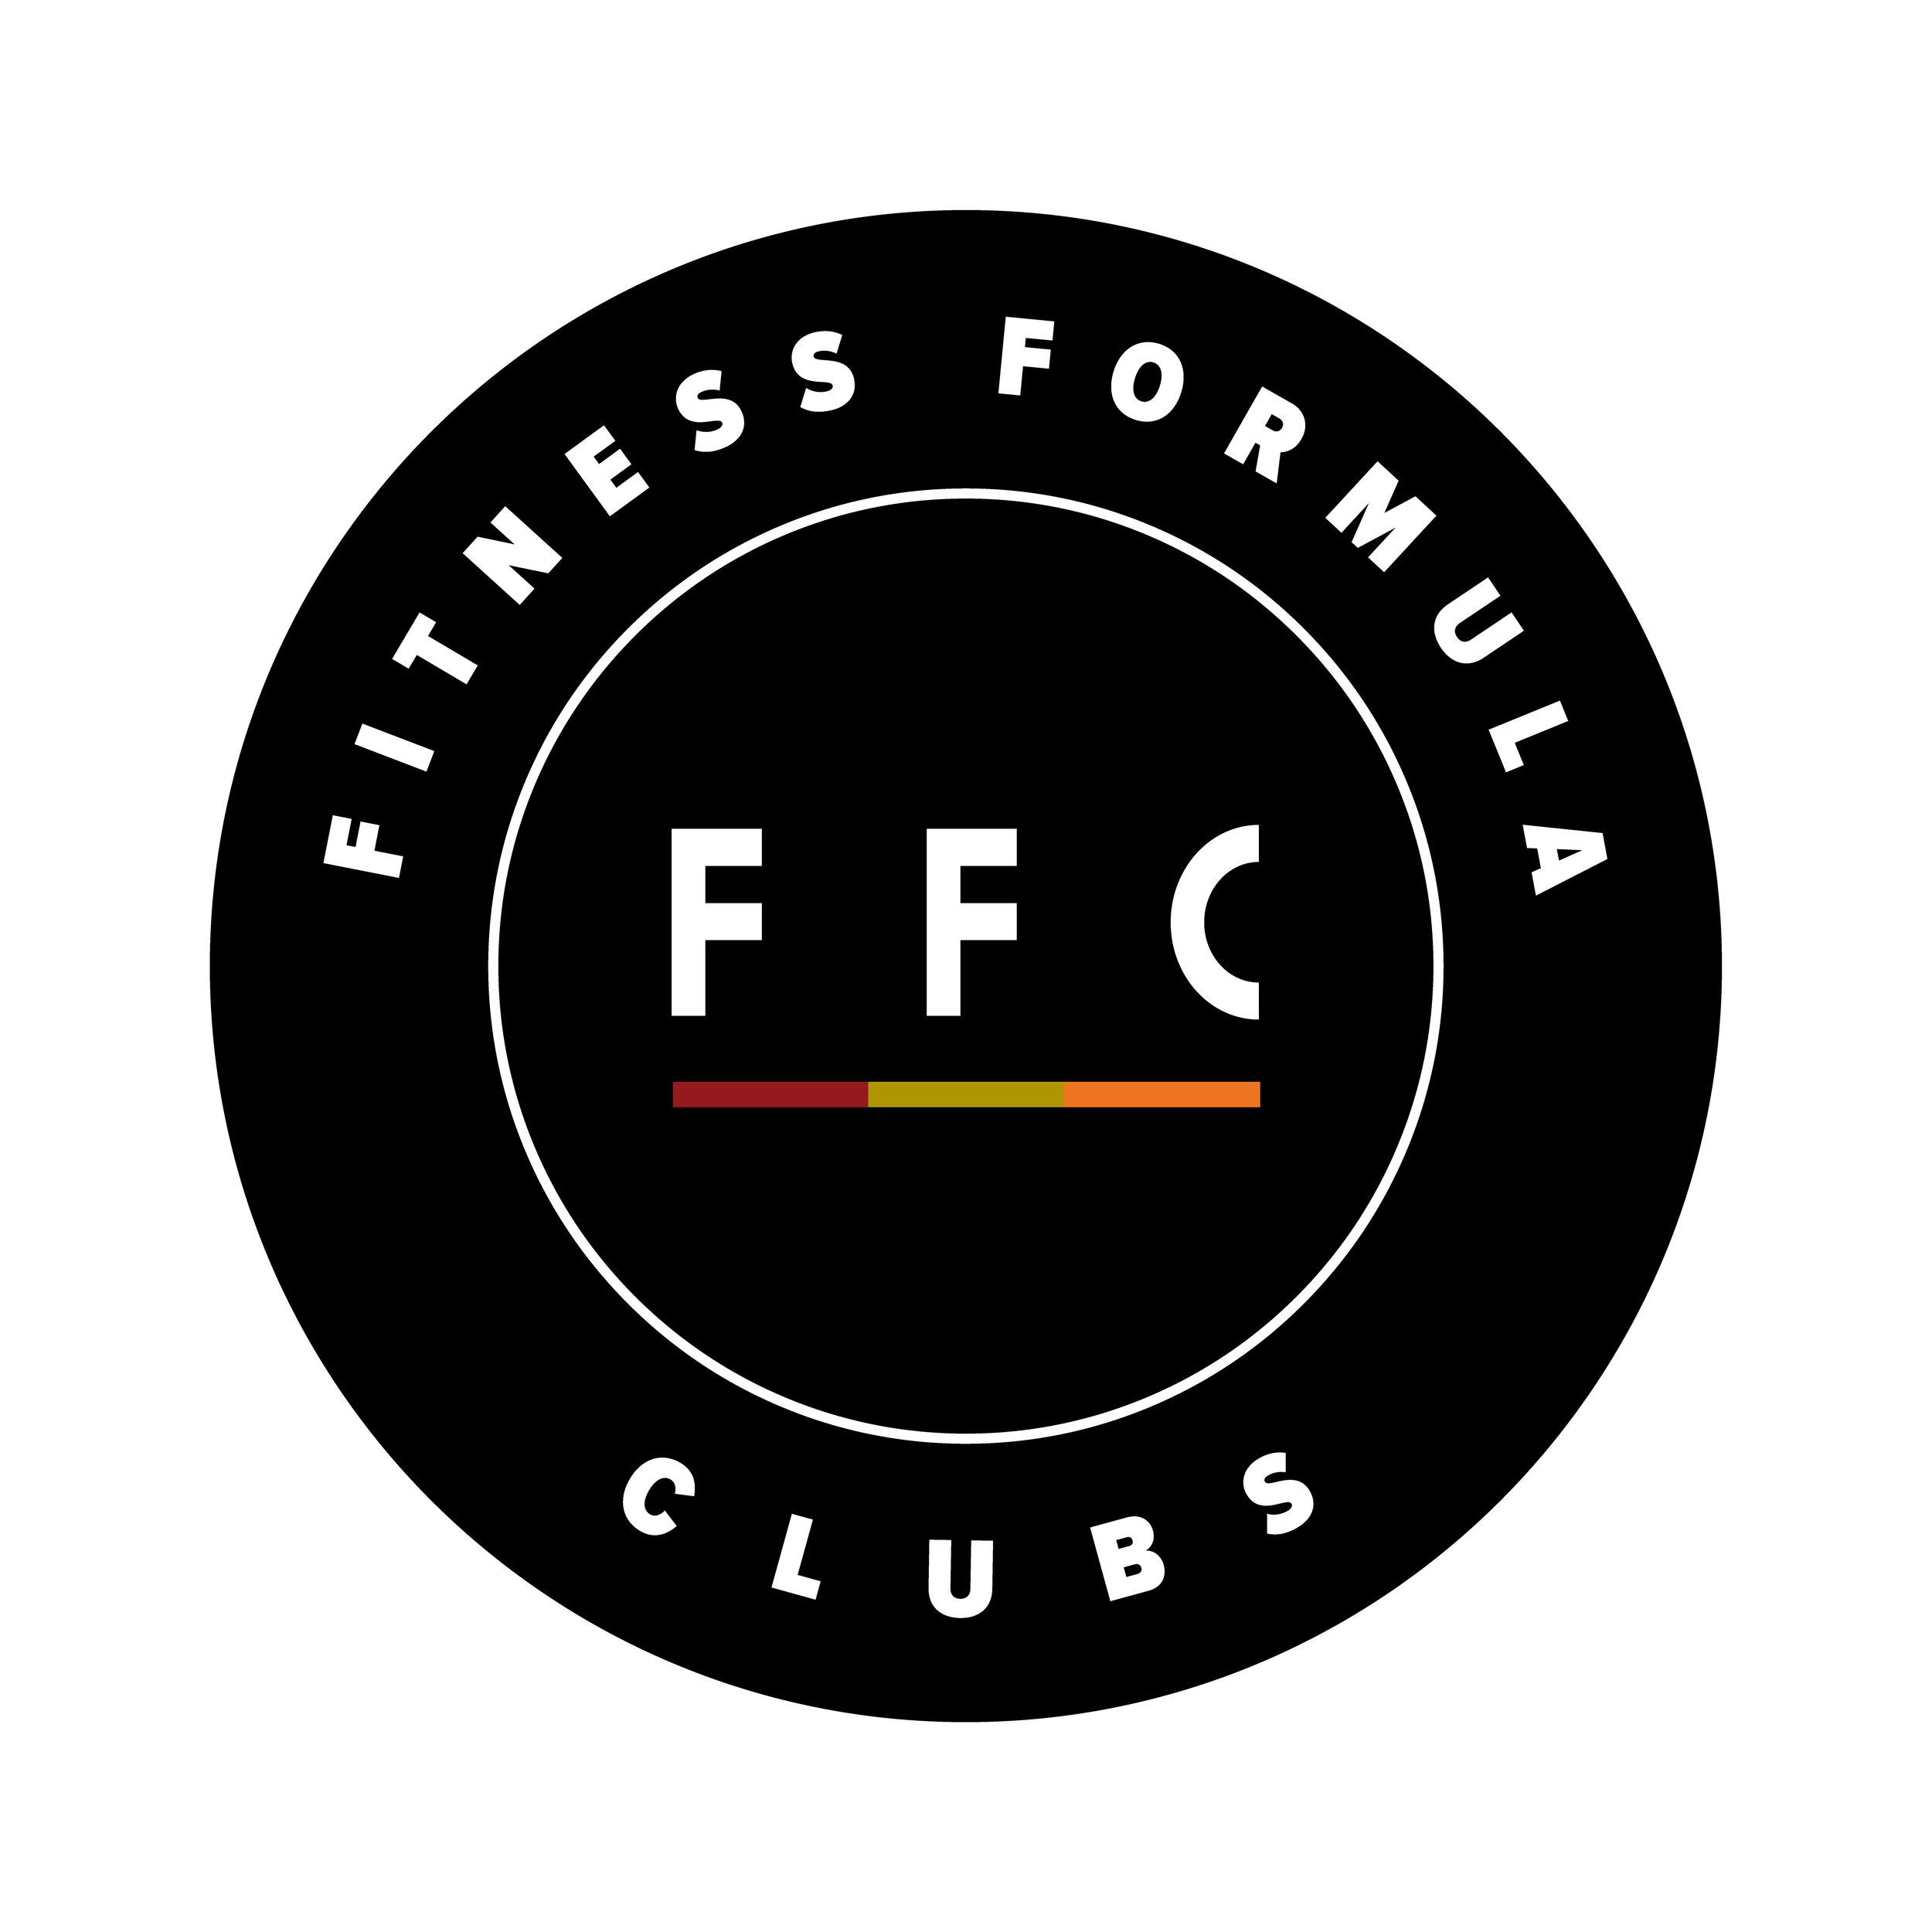 FFC_new logo.jpg